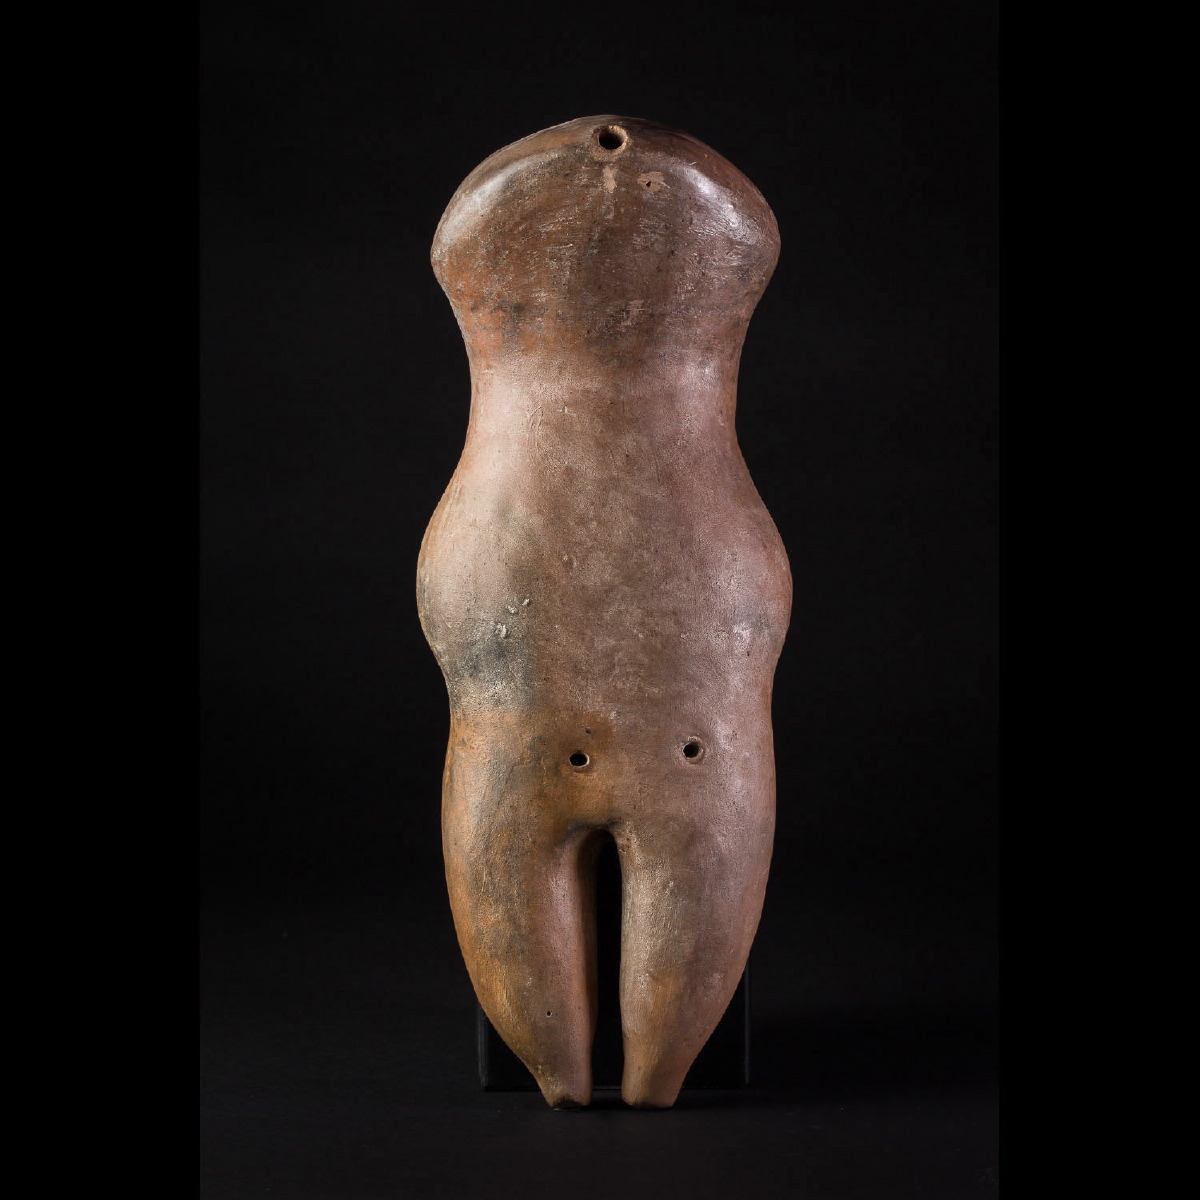 Photo of ocarina-ecuador-gangala-terracotta-museum-quality-galerie-golconda